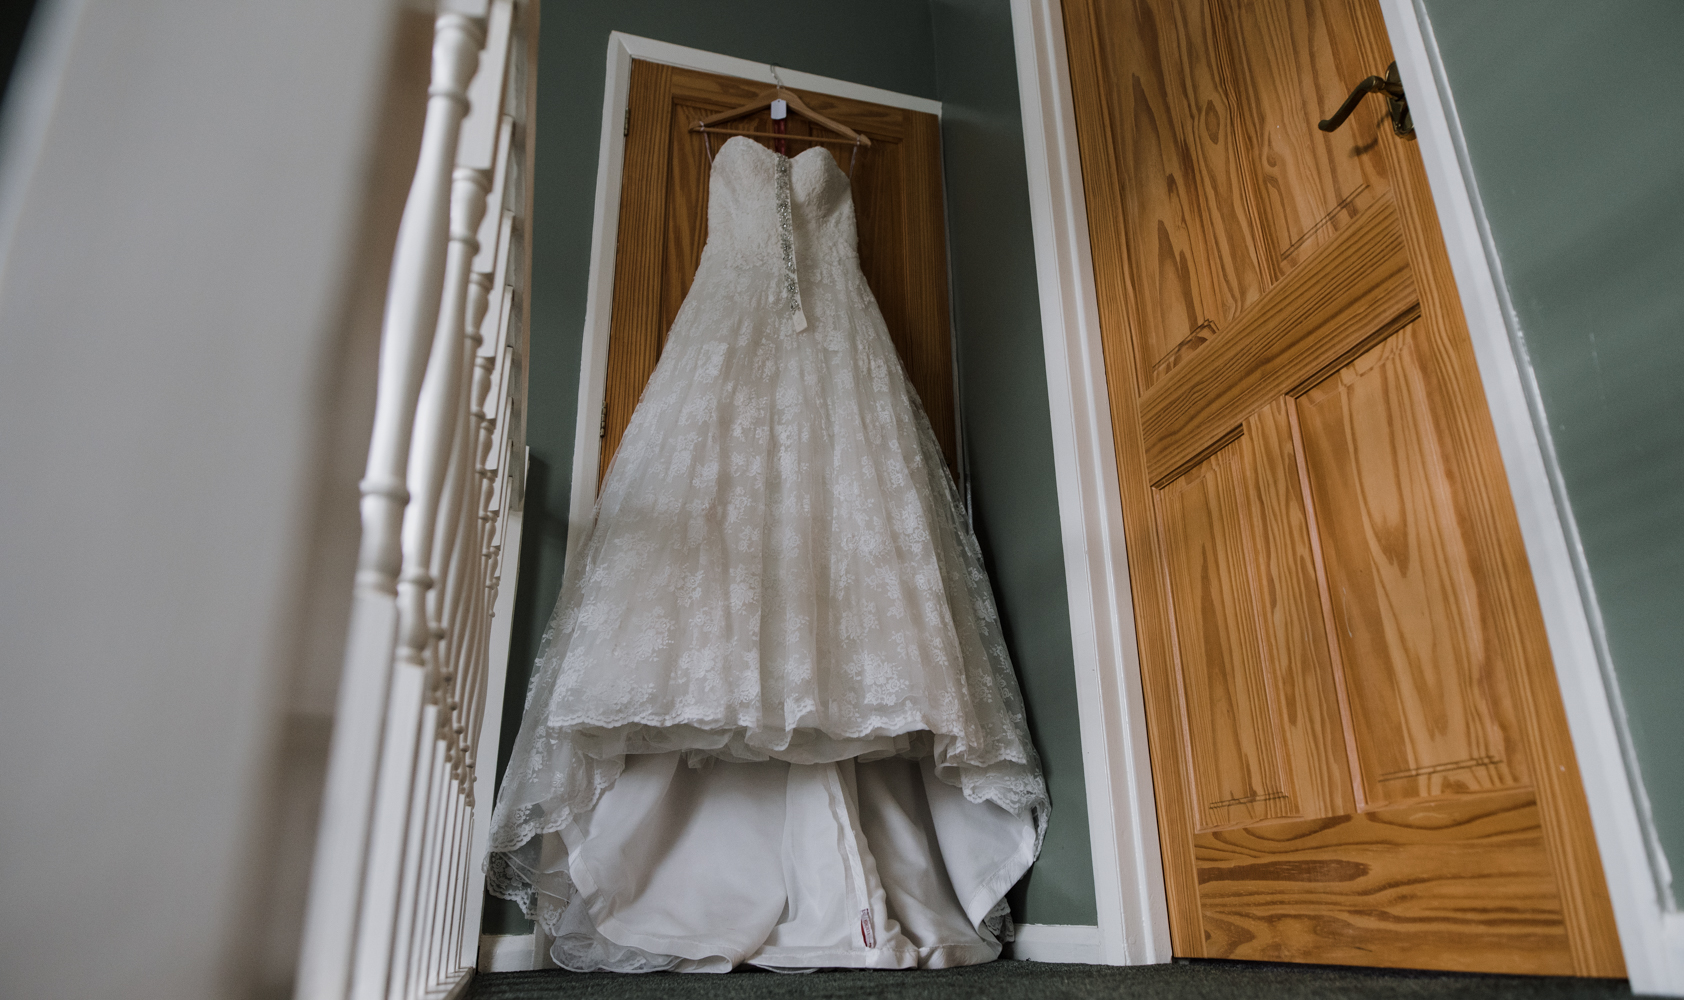 The wedding dress hanging on the landing